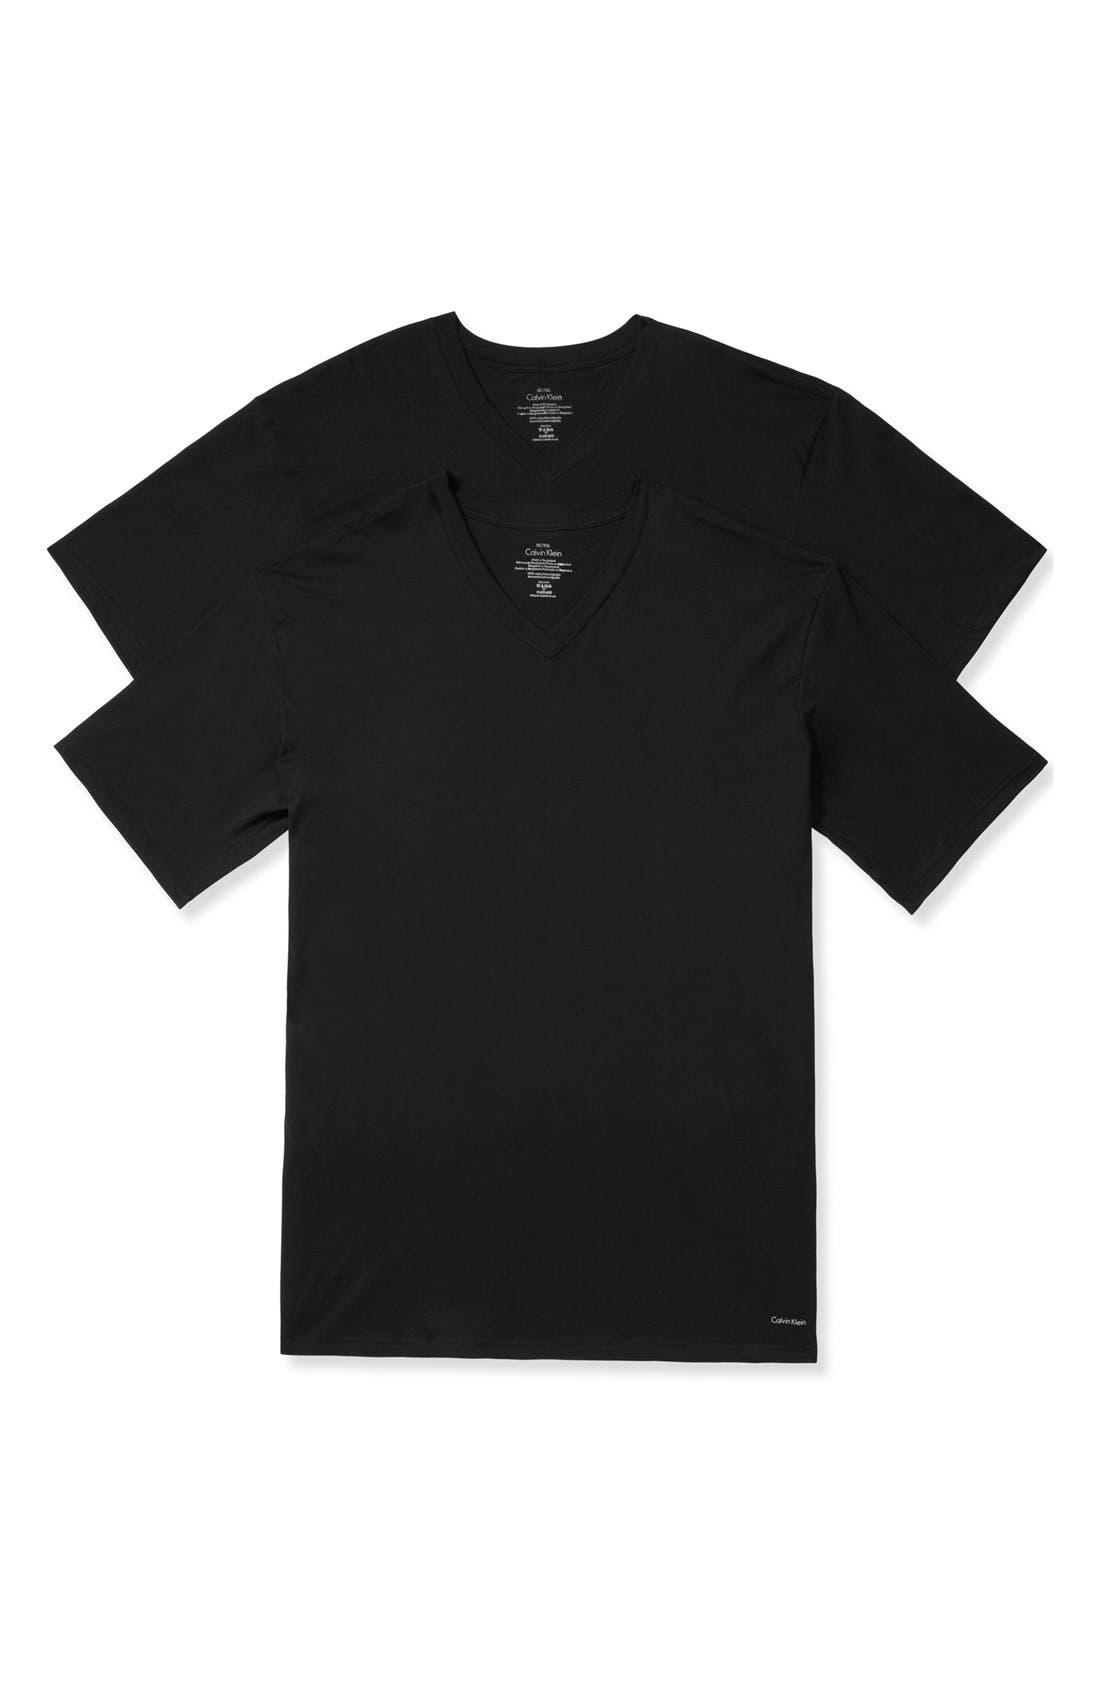 Alternate Image 1 Selected - Calvin Klein 2-Pack Cotton T-Shirt